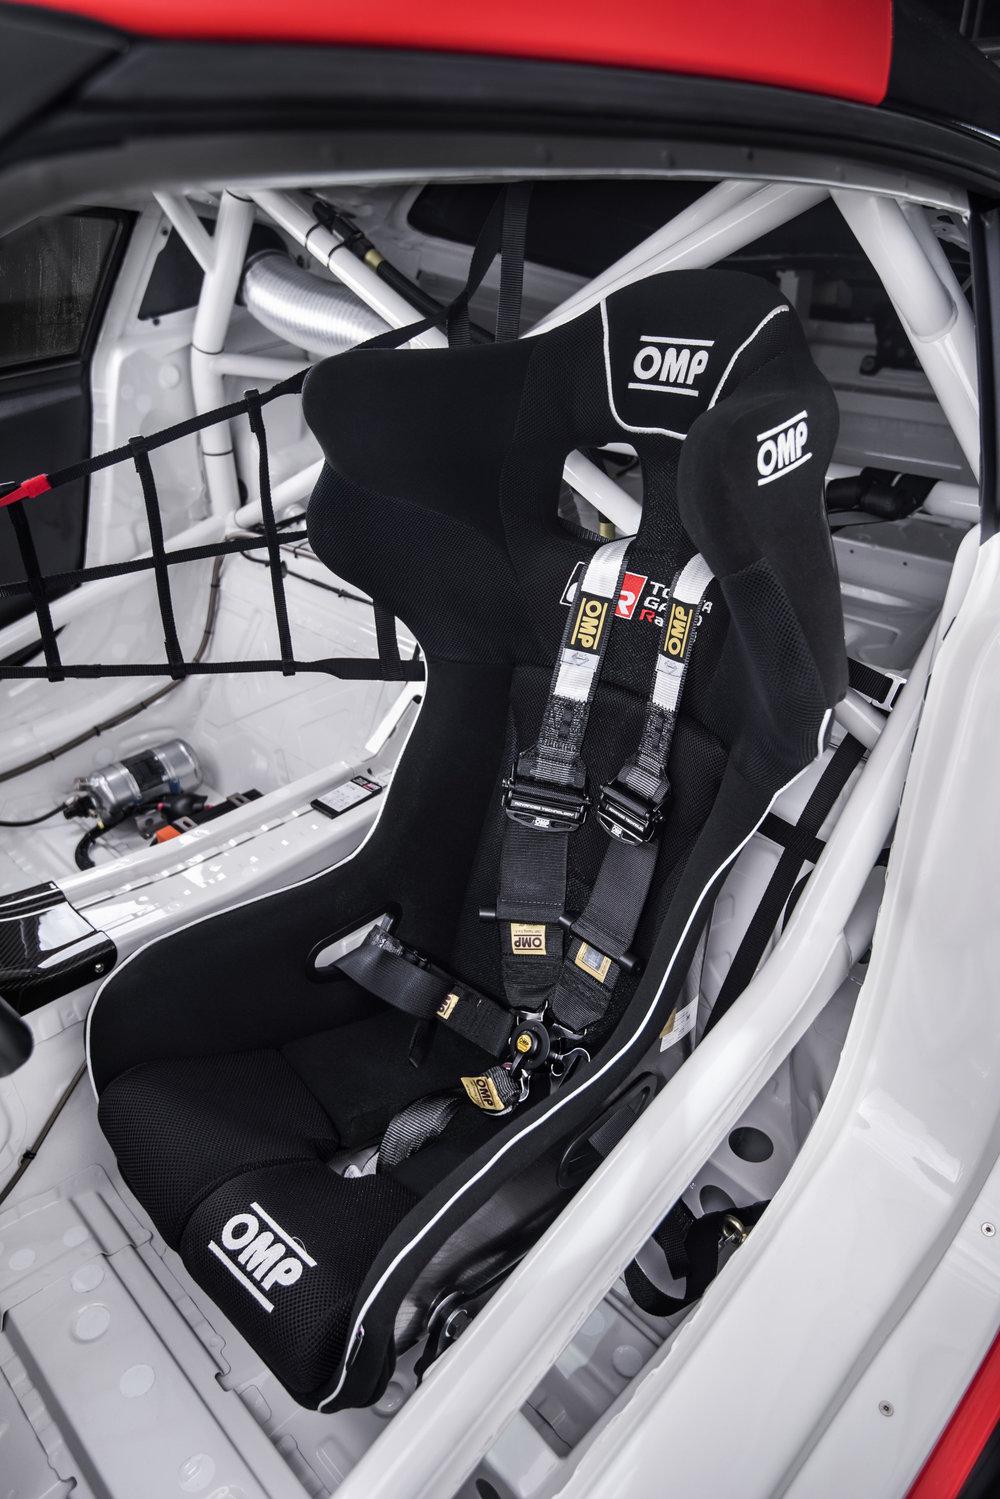 GR_Supra_Racing_Concept_Interior_Details_07_CDFDAD4040CA4983A4DCBE62619CE97A17EB4EE5.JPG